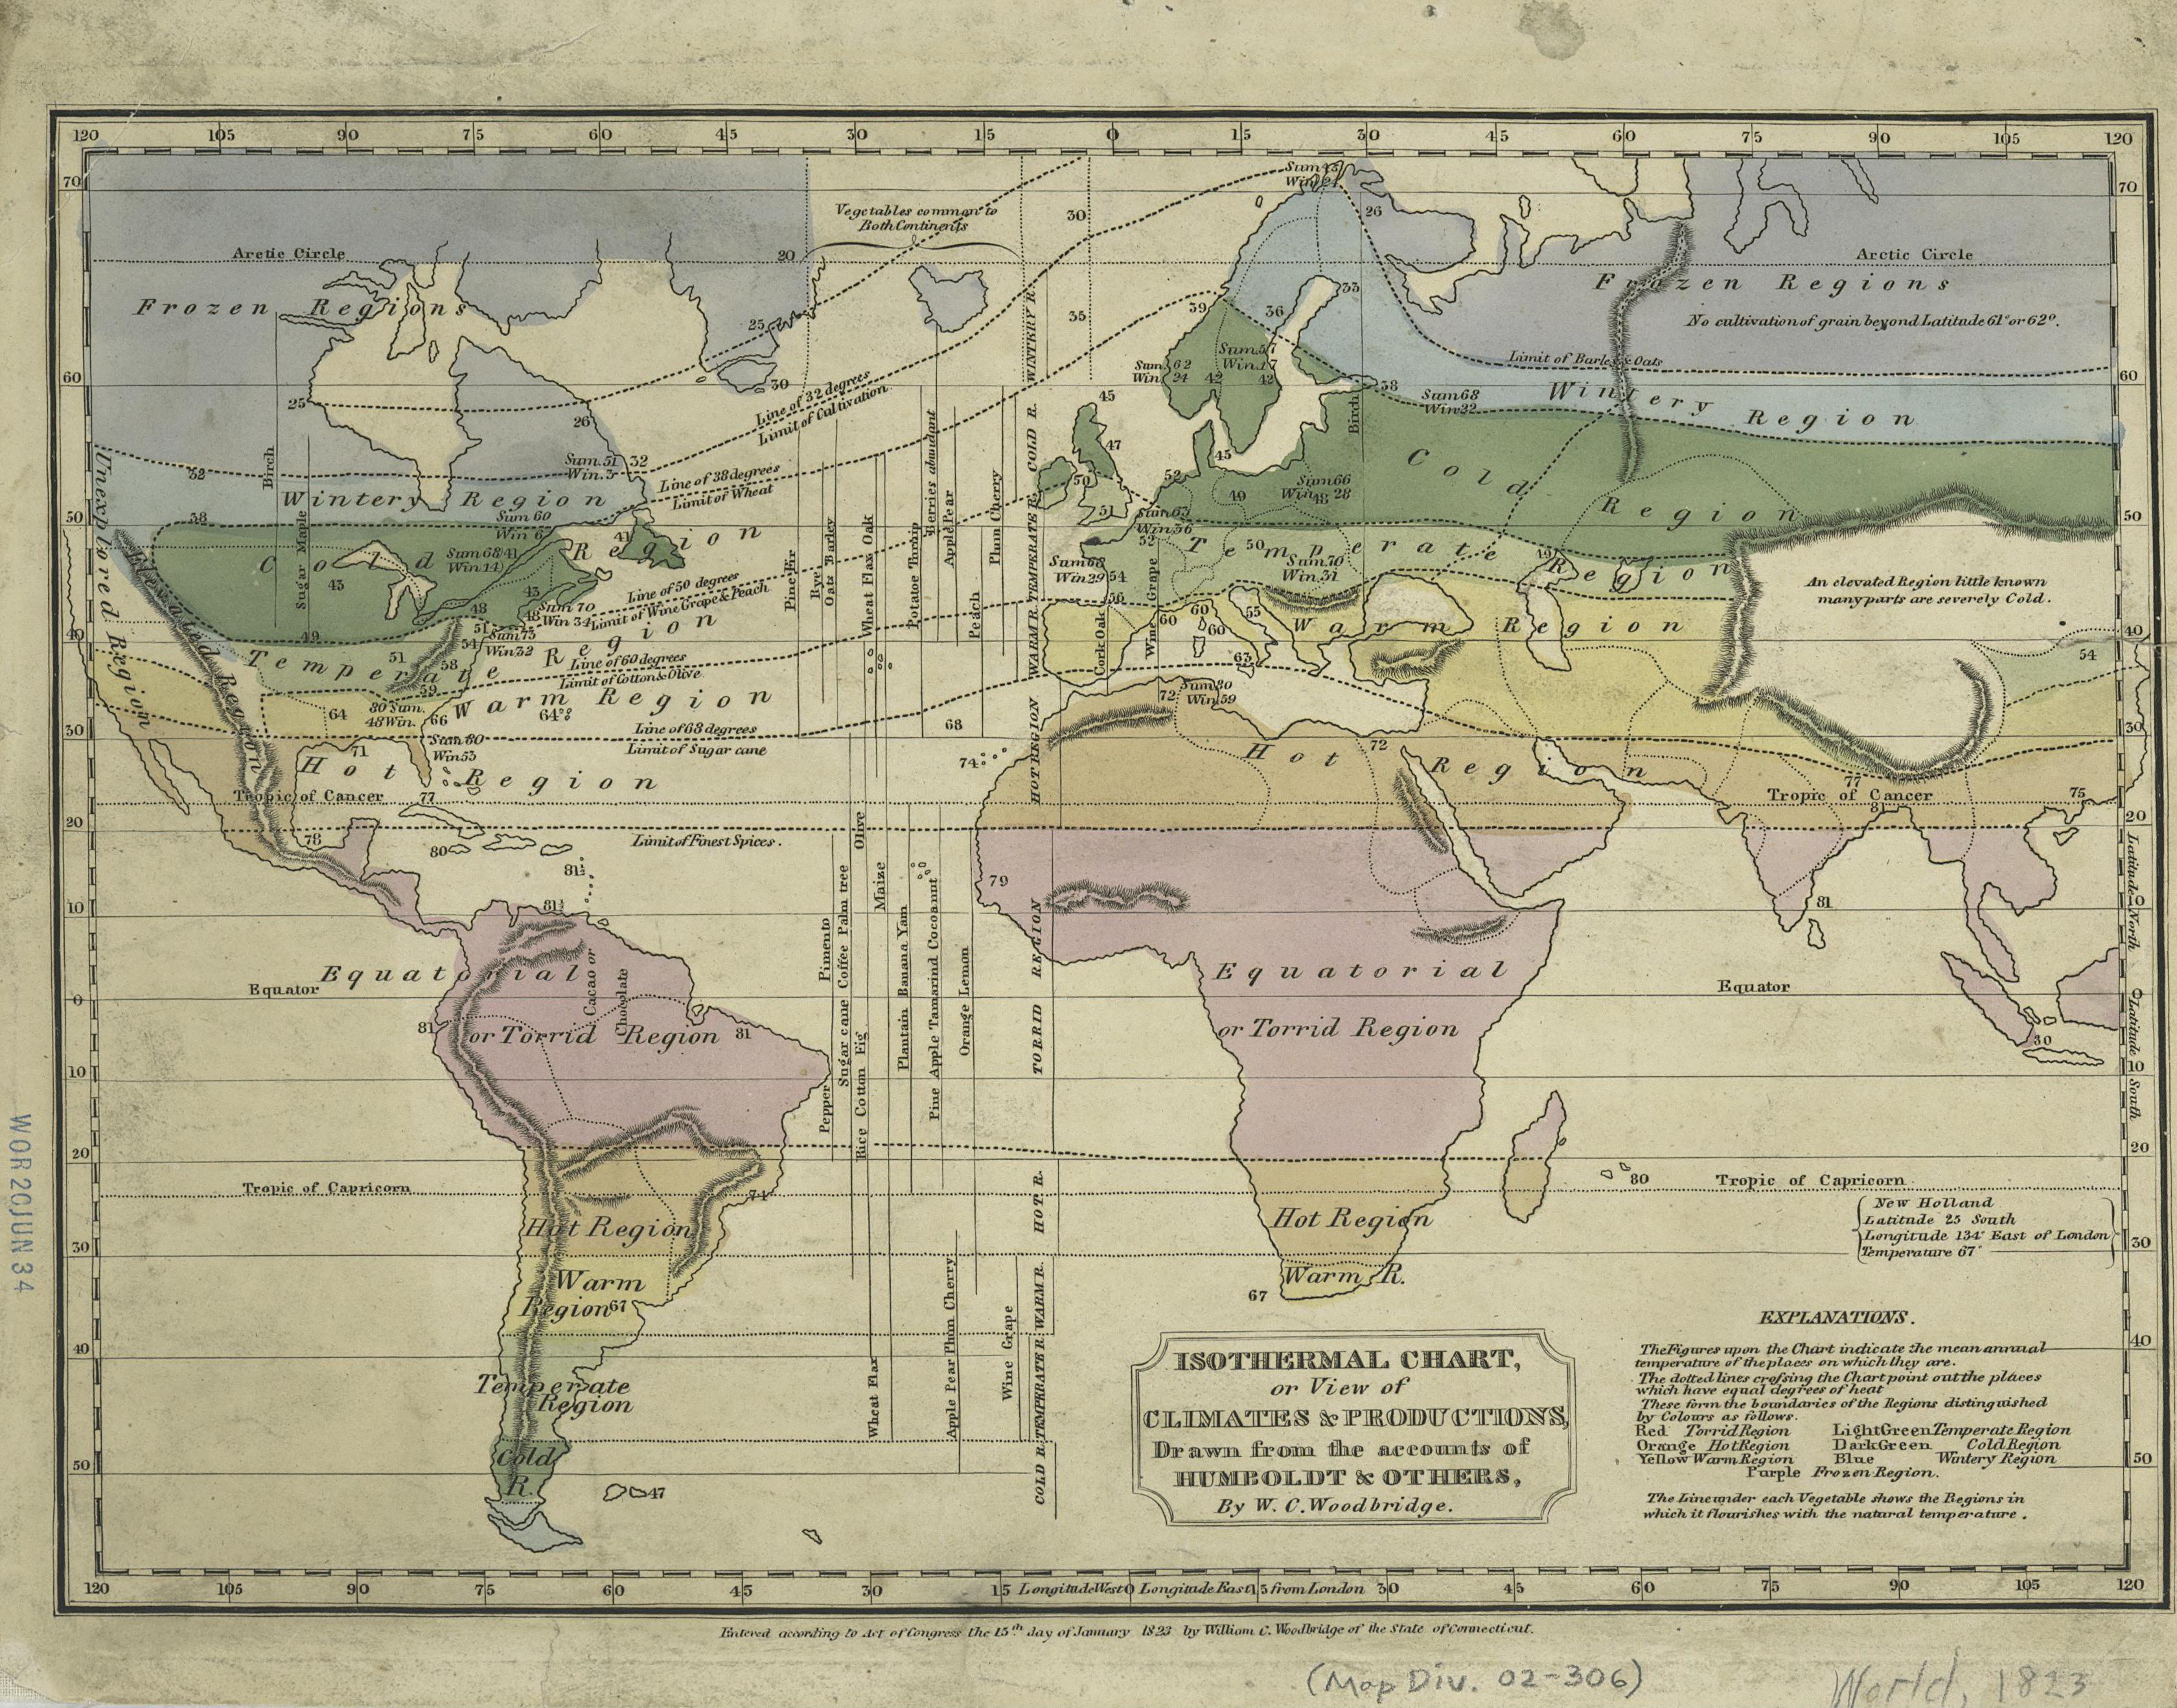 Time Zones Chart: Woodbridge isothermal chart.jpg - Wikimedia Commons,Chart